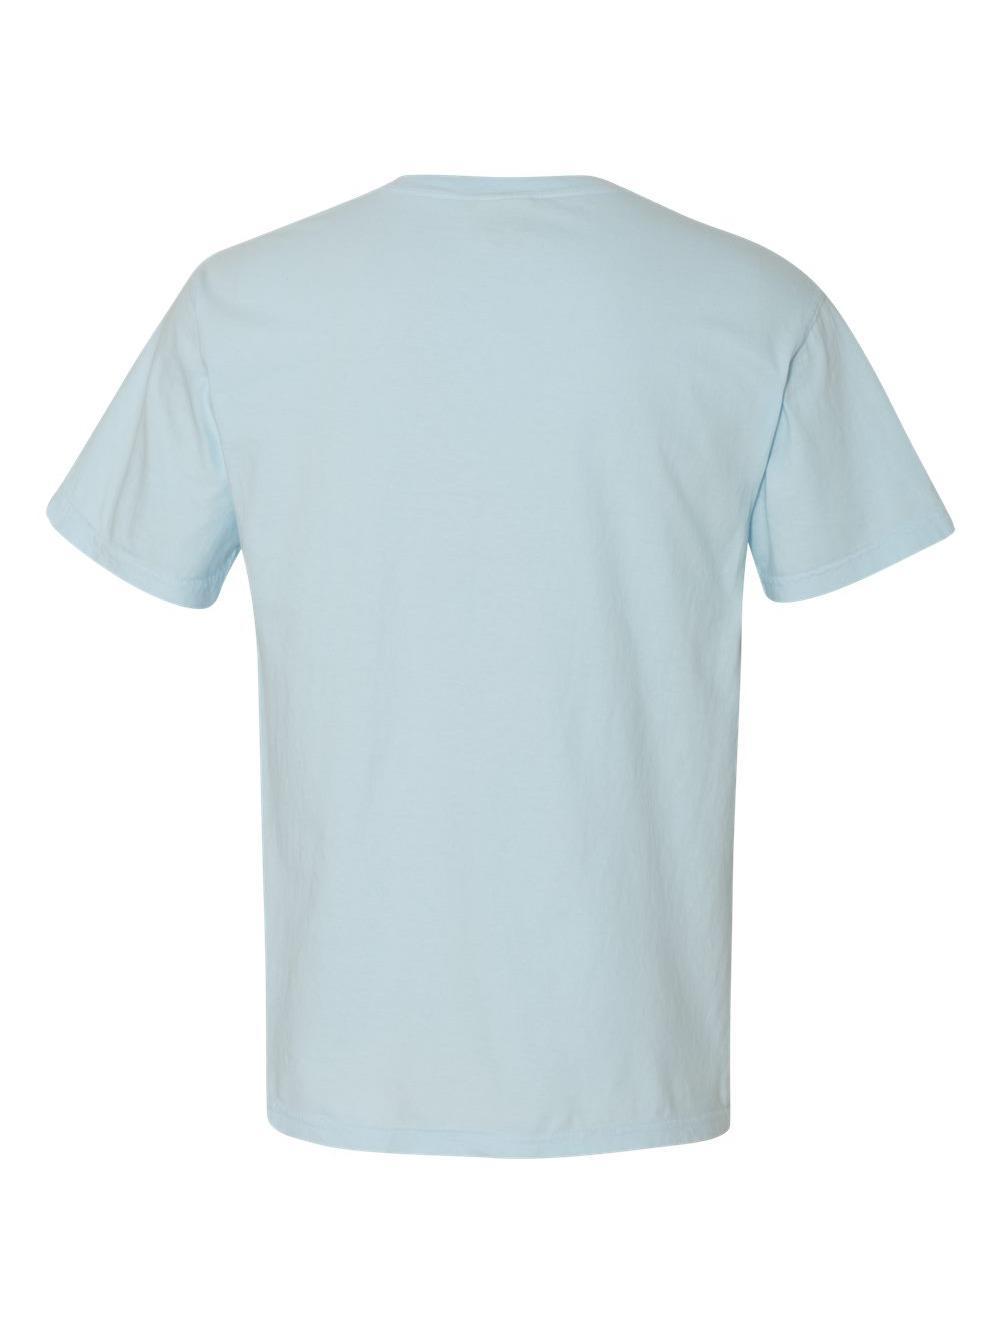 Comfort-Colors-Garment-Dyed-Heavyweight-Ringspun-Short-Sleeve-Shirt-1717 thumbnail 34